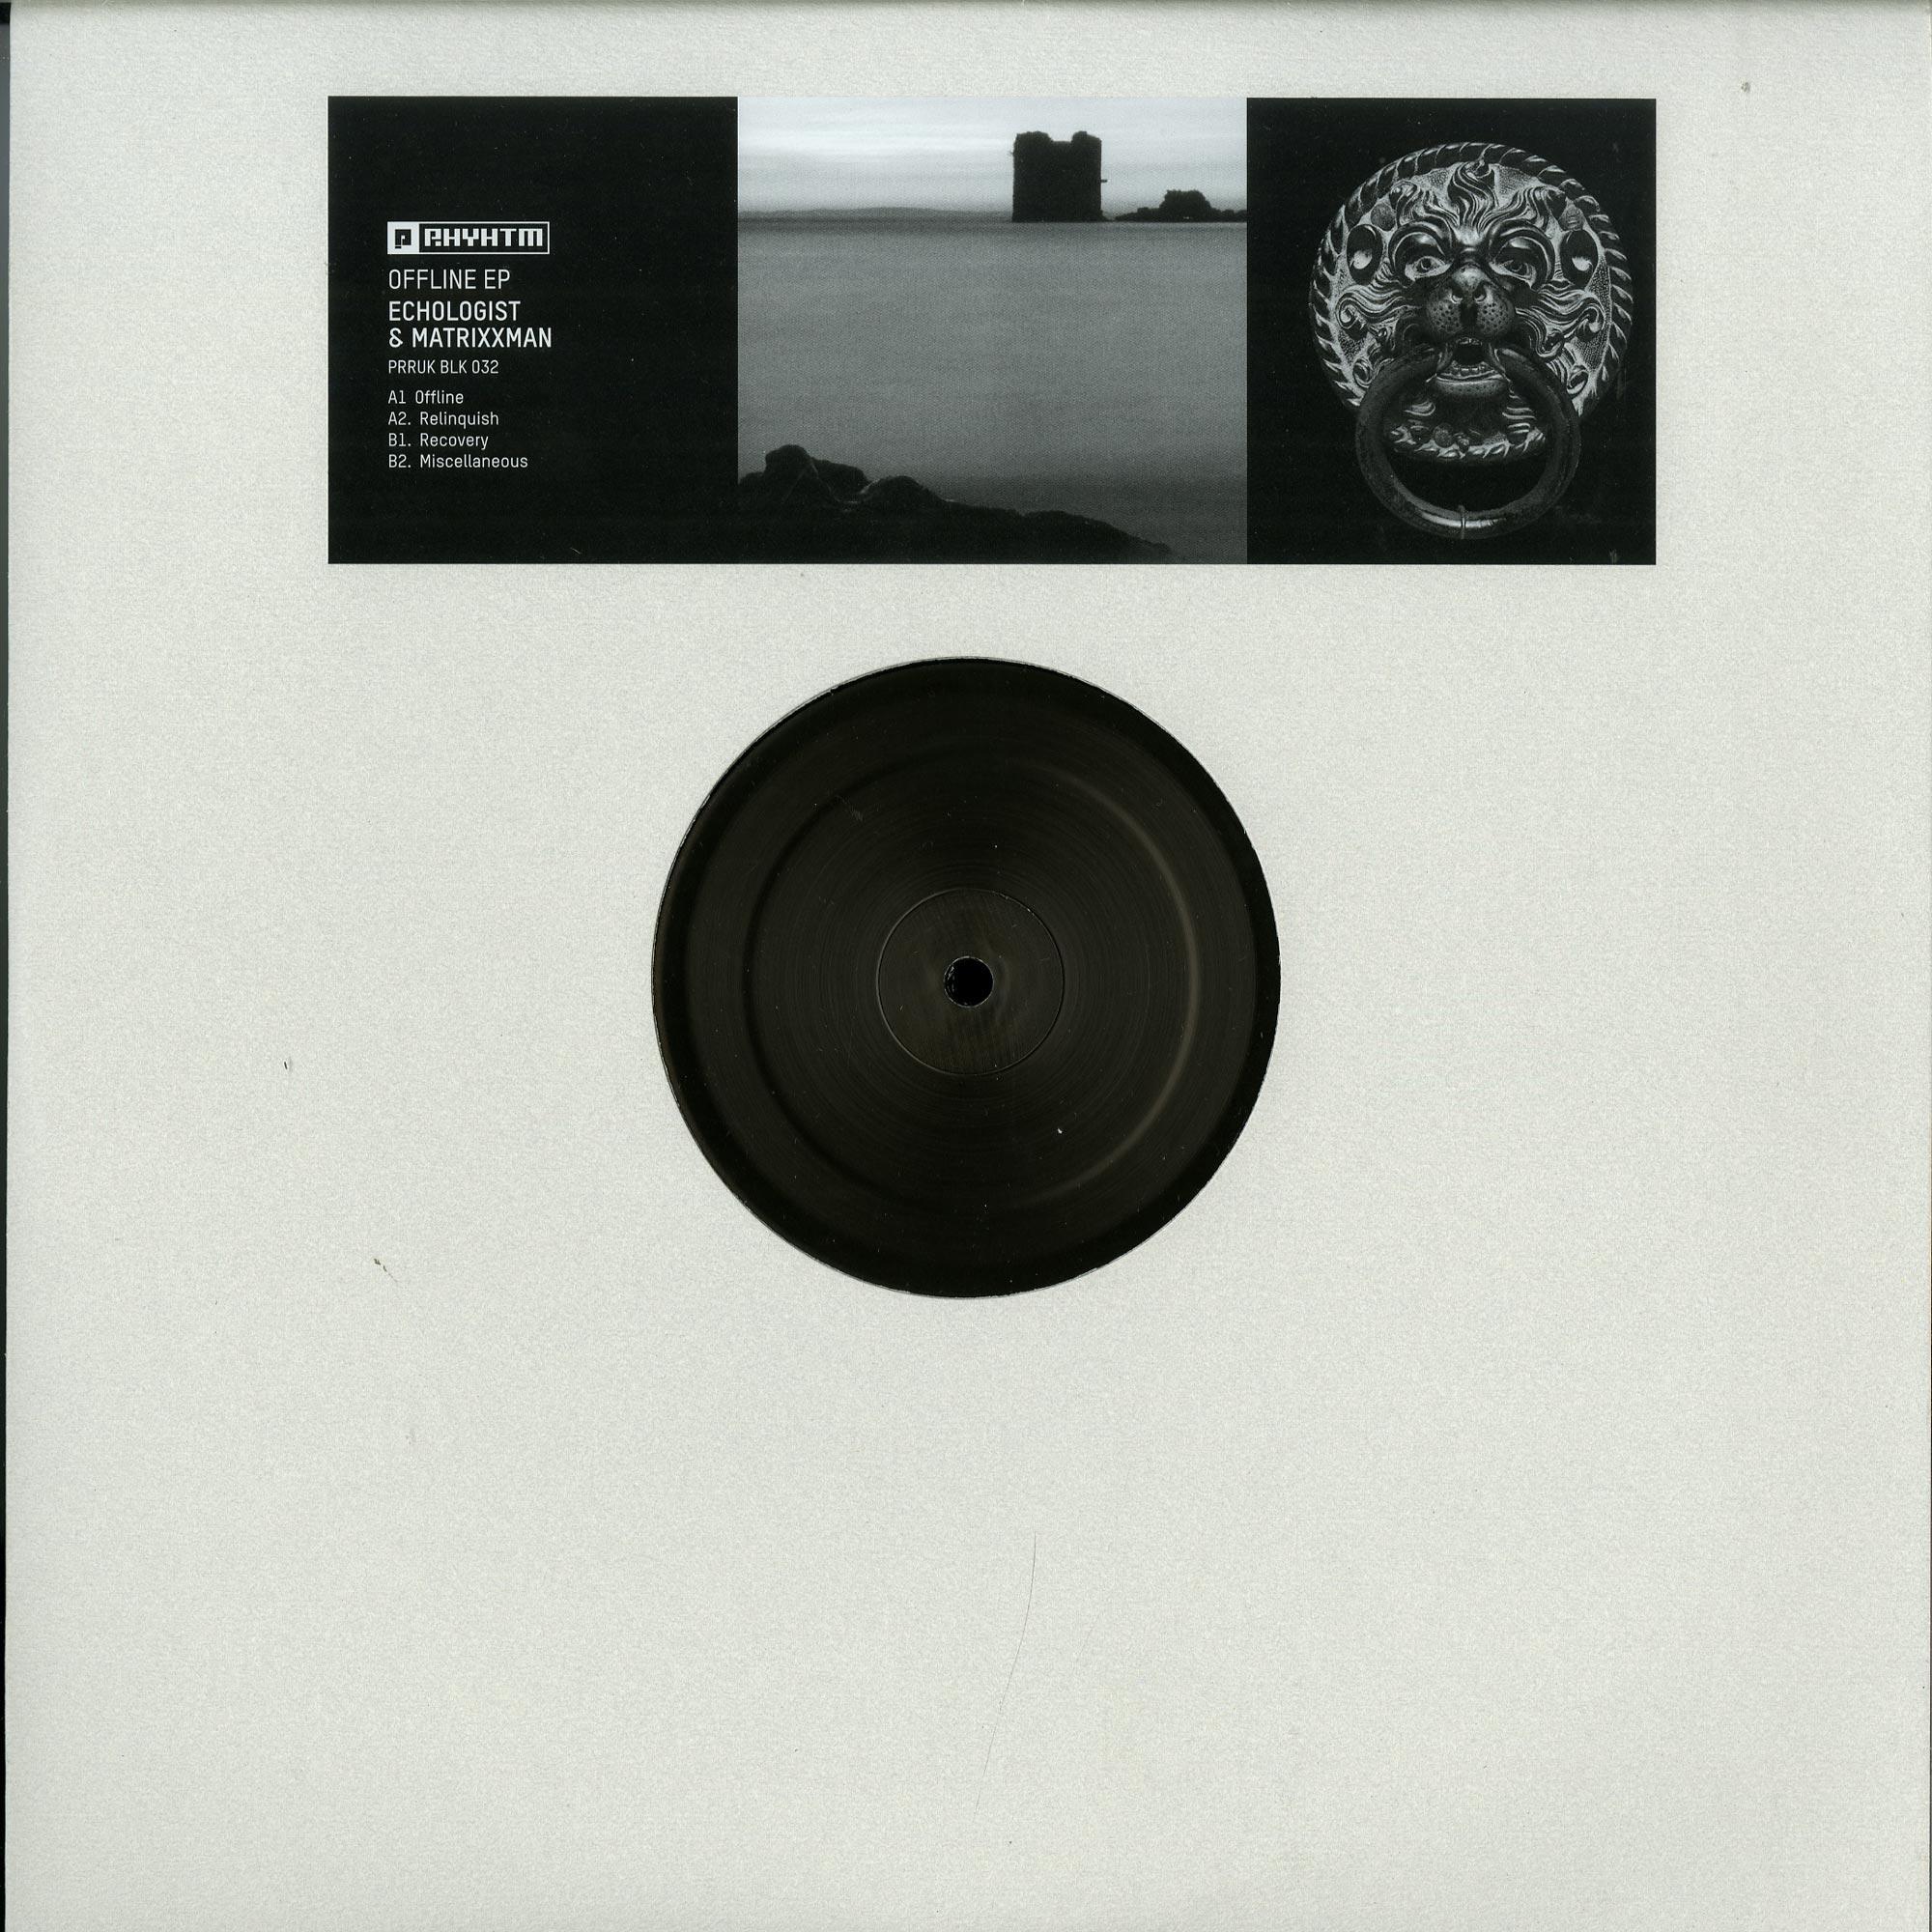 Echologist & Matrixxman - OFFLINE EP